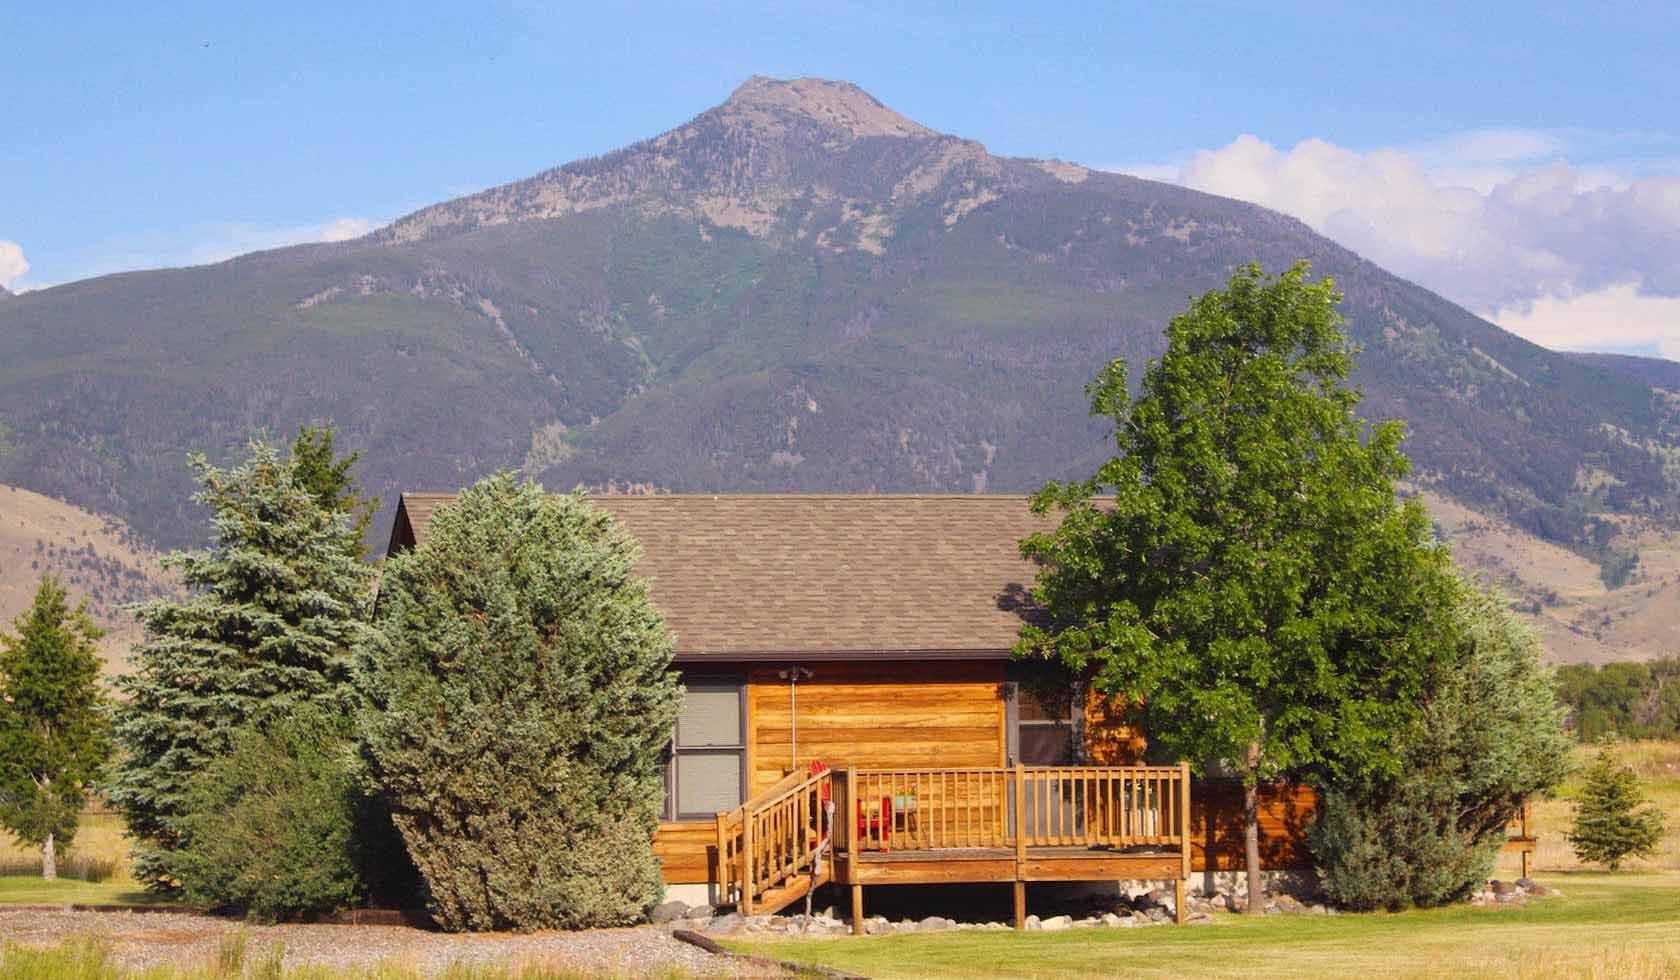 Johnstad's Bed & Breakfast & Log Cabin profile image